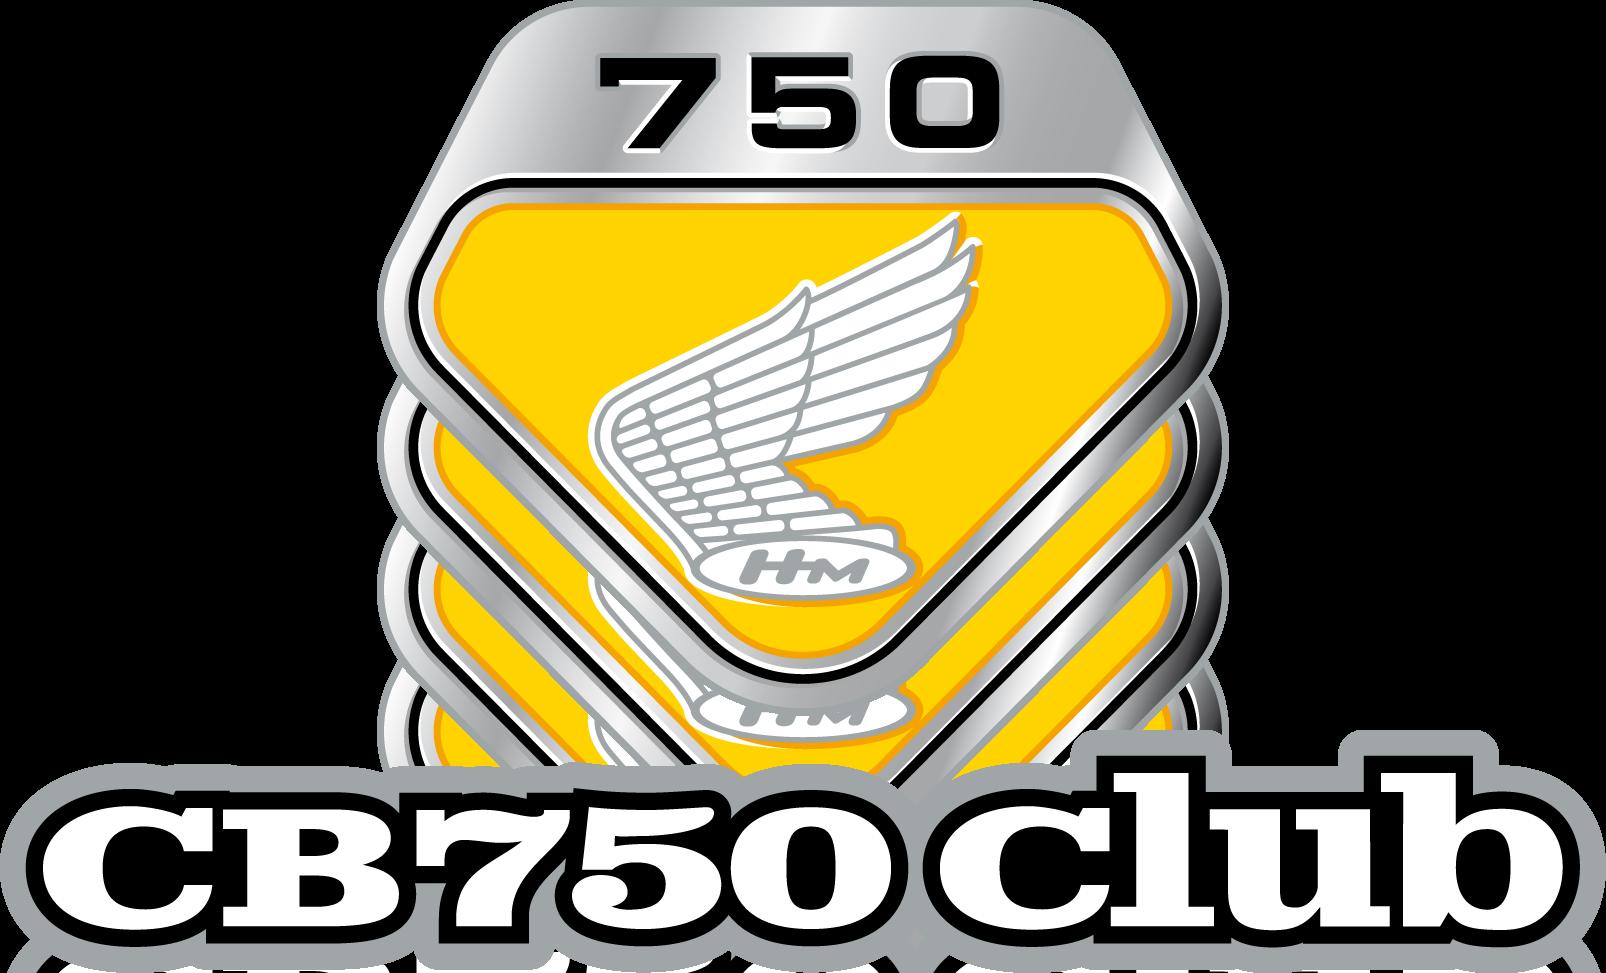 LE CB 750 CLUB